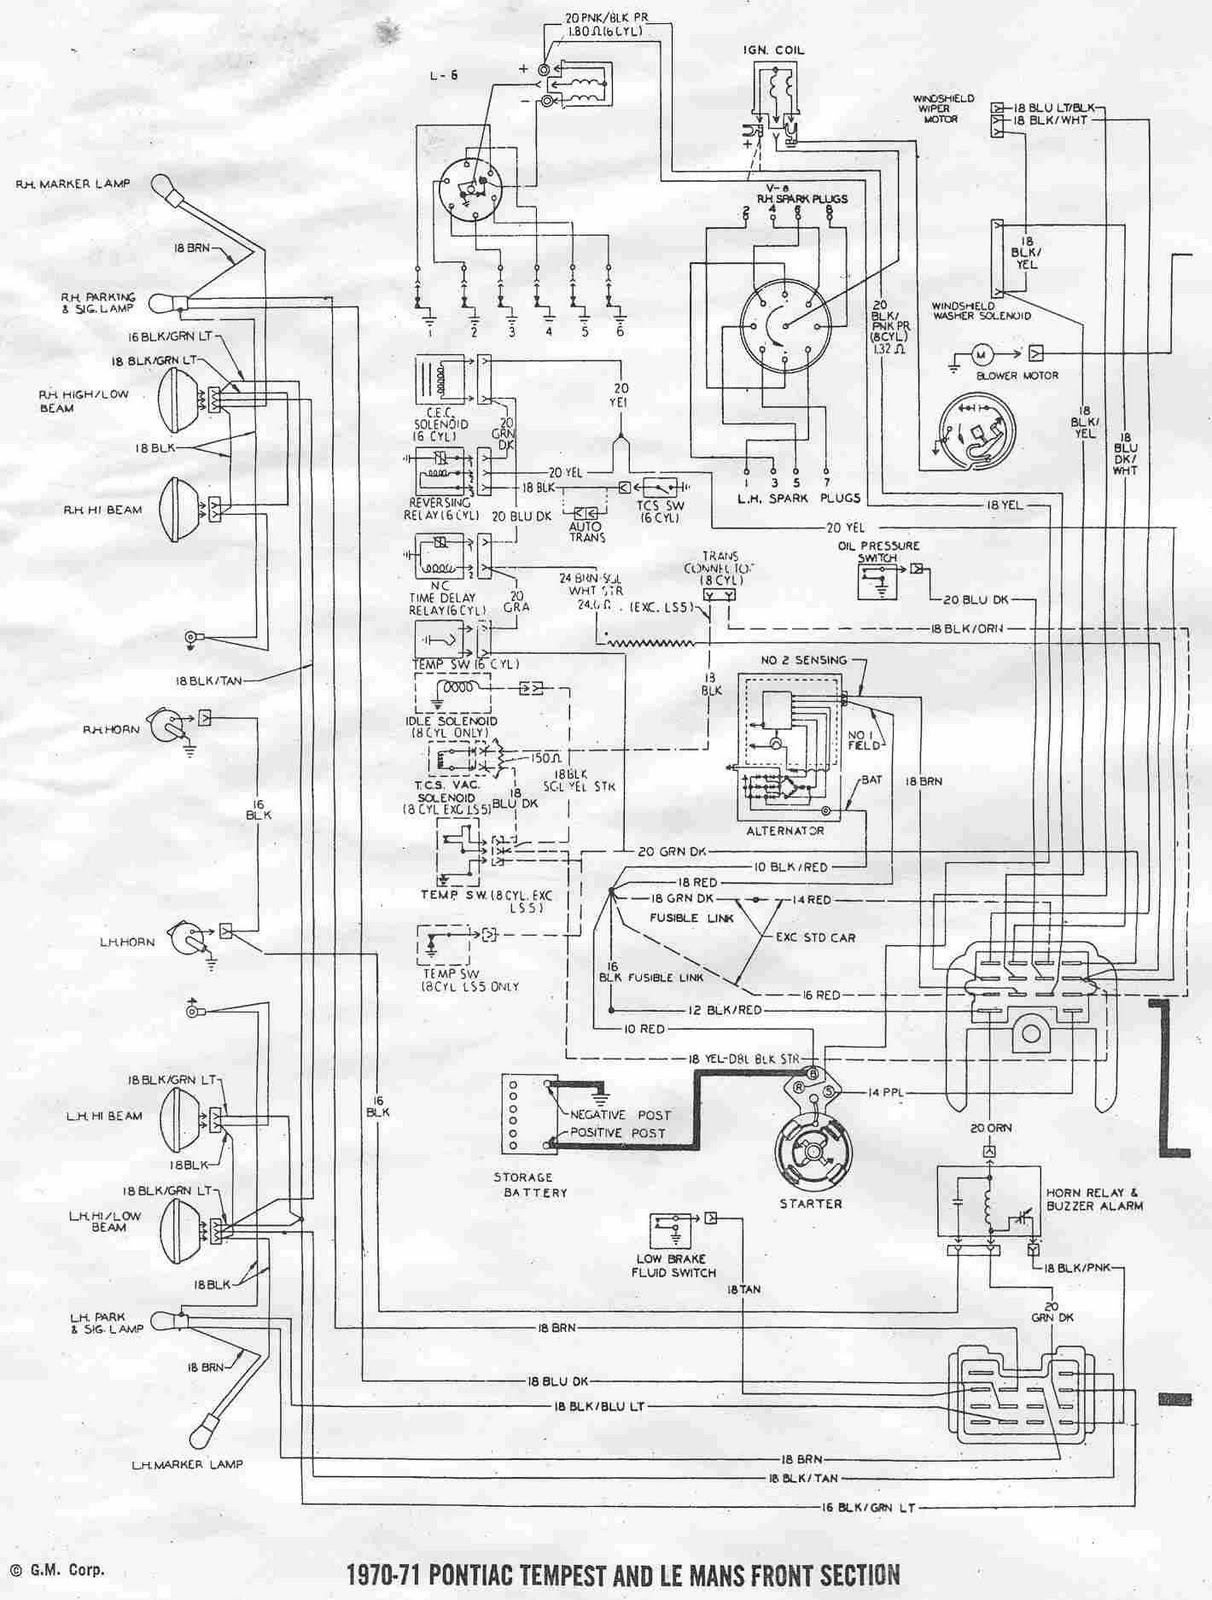 1967 pontiac lemans wiring diagram wiring diagrams rh 34 jennifer retzke de 1964 pontiac gto wiring [ 1212 x 1600 Pixel ]